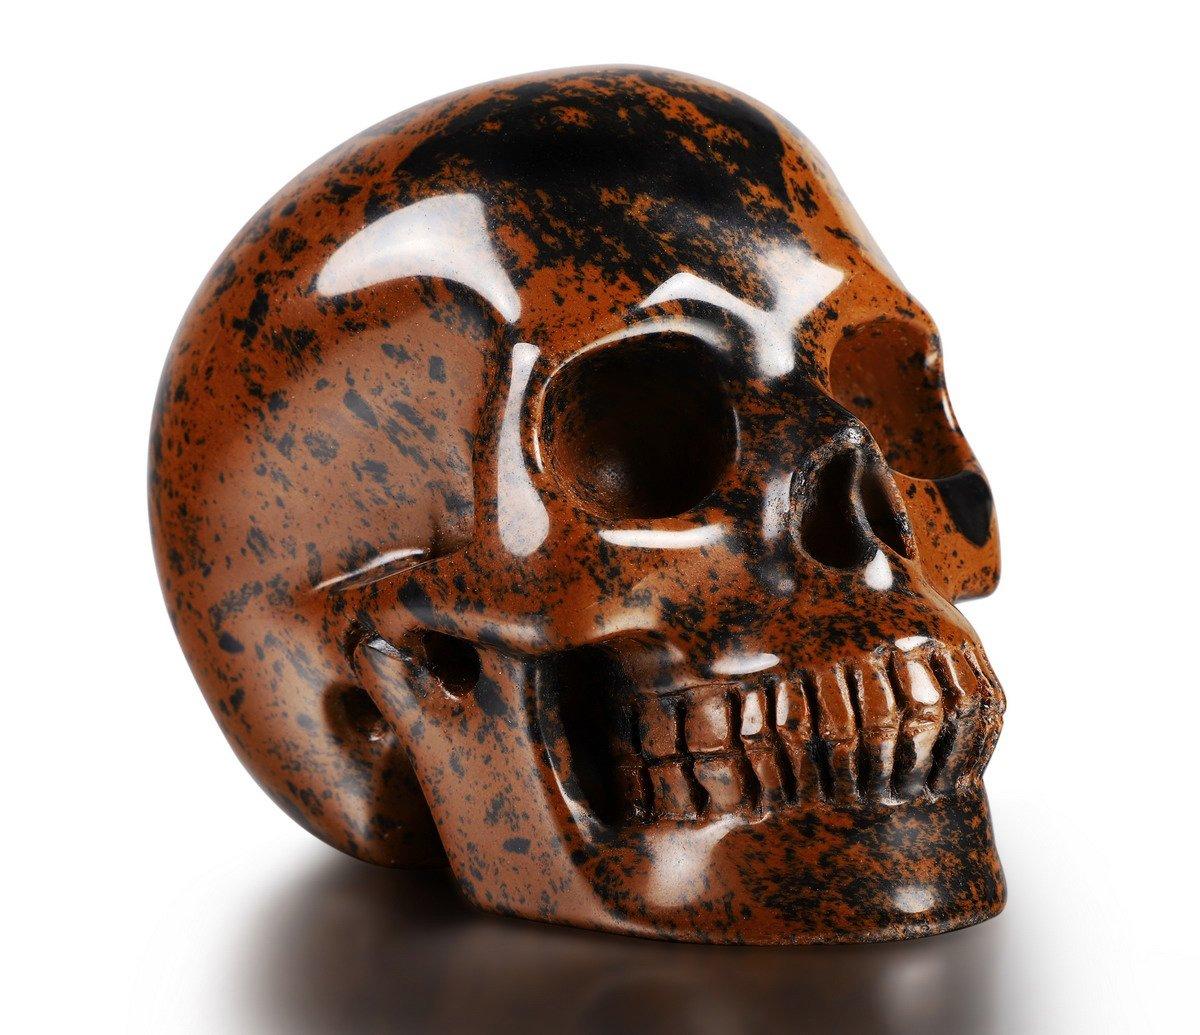 Skullis 2.0-3.0'' Mahogany Obsidian Crystal Skull. Hand Carved Gemstone Fine Art Sculpture, Reiki Healing Stone Statue.